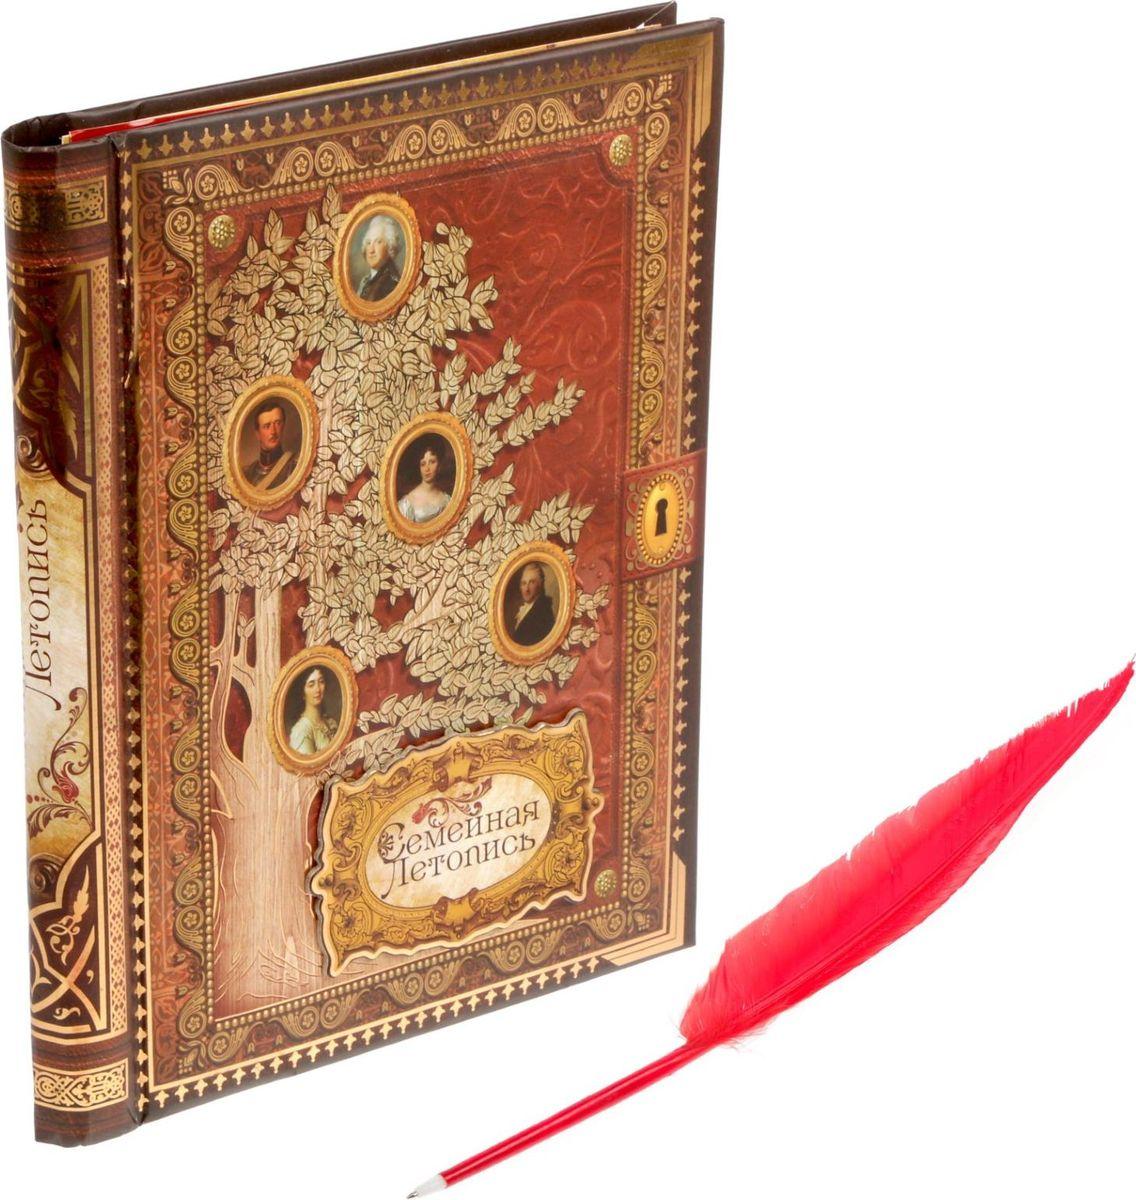 Родословная книга Семейная летопись, с пером, 24,5 х 29,2 х 3 см книга родословная купить в екатеринбурге